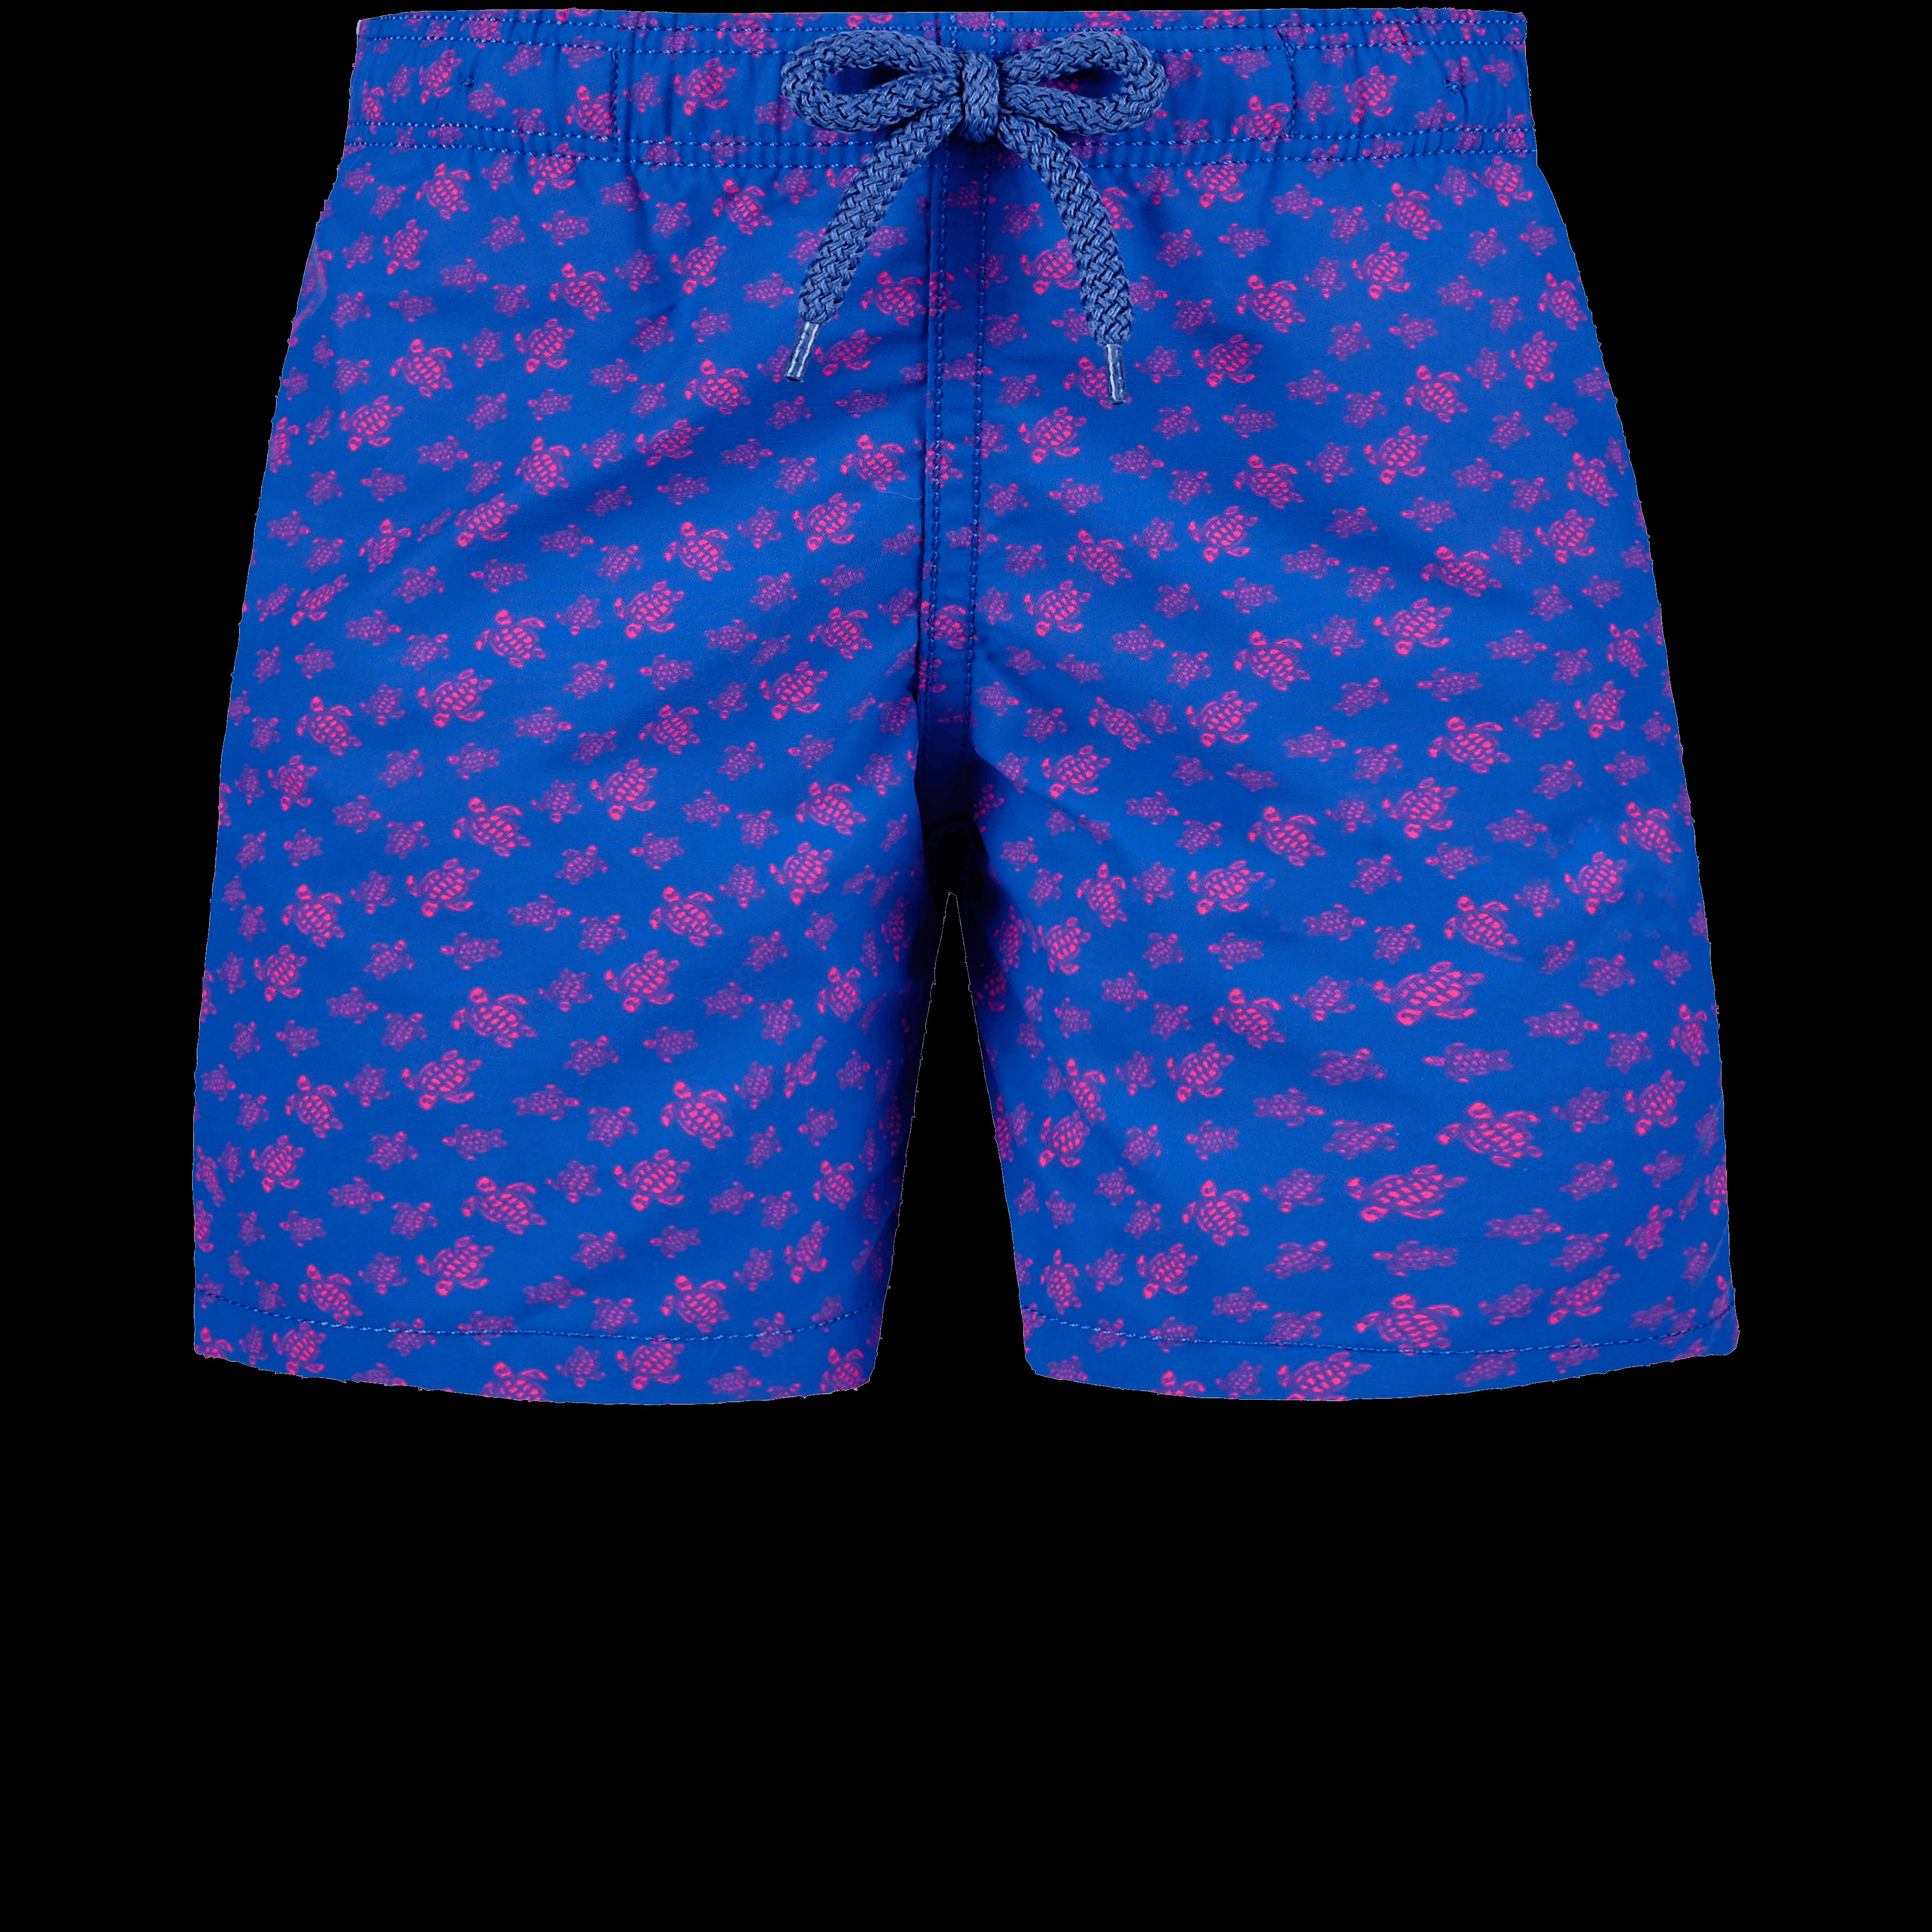 VILEBREQUIN | Boys Swimwear - Boys Swimwear Micro Ronde Des Tortues - SWIMMING TRUNK - JIM - Blue - 14 - Vilebrequin | Goxip